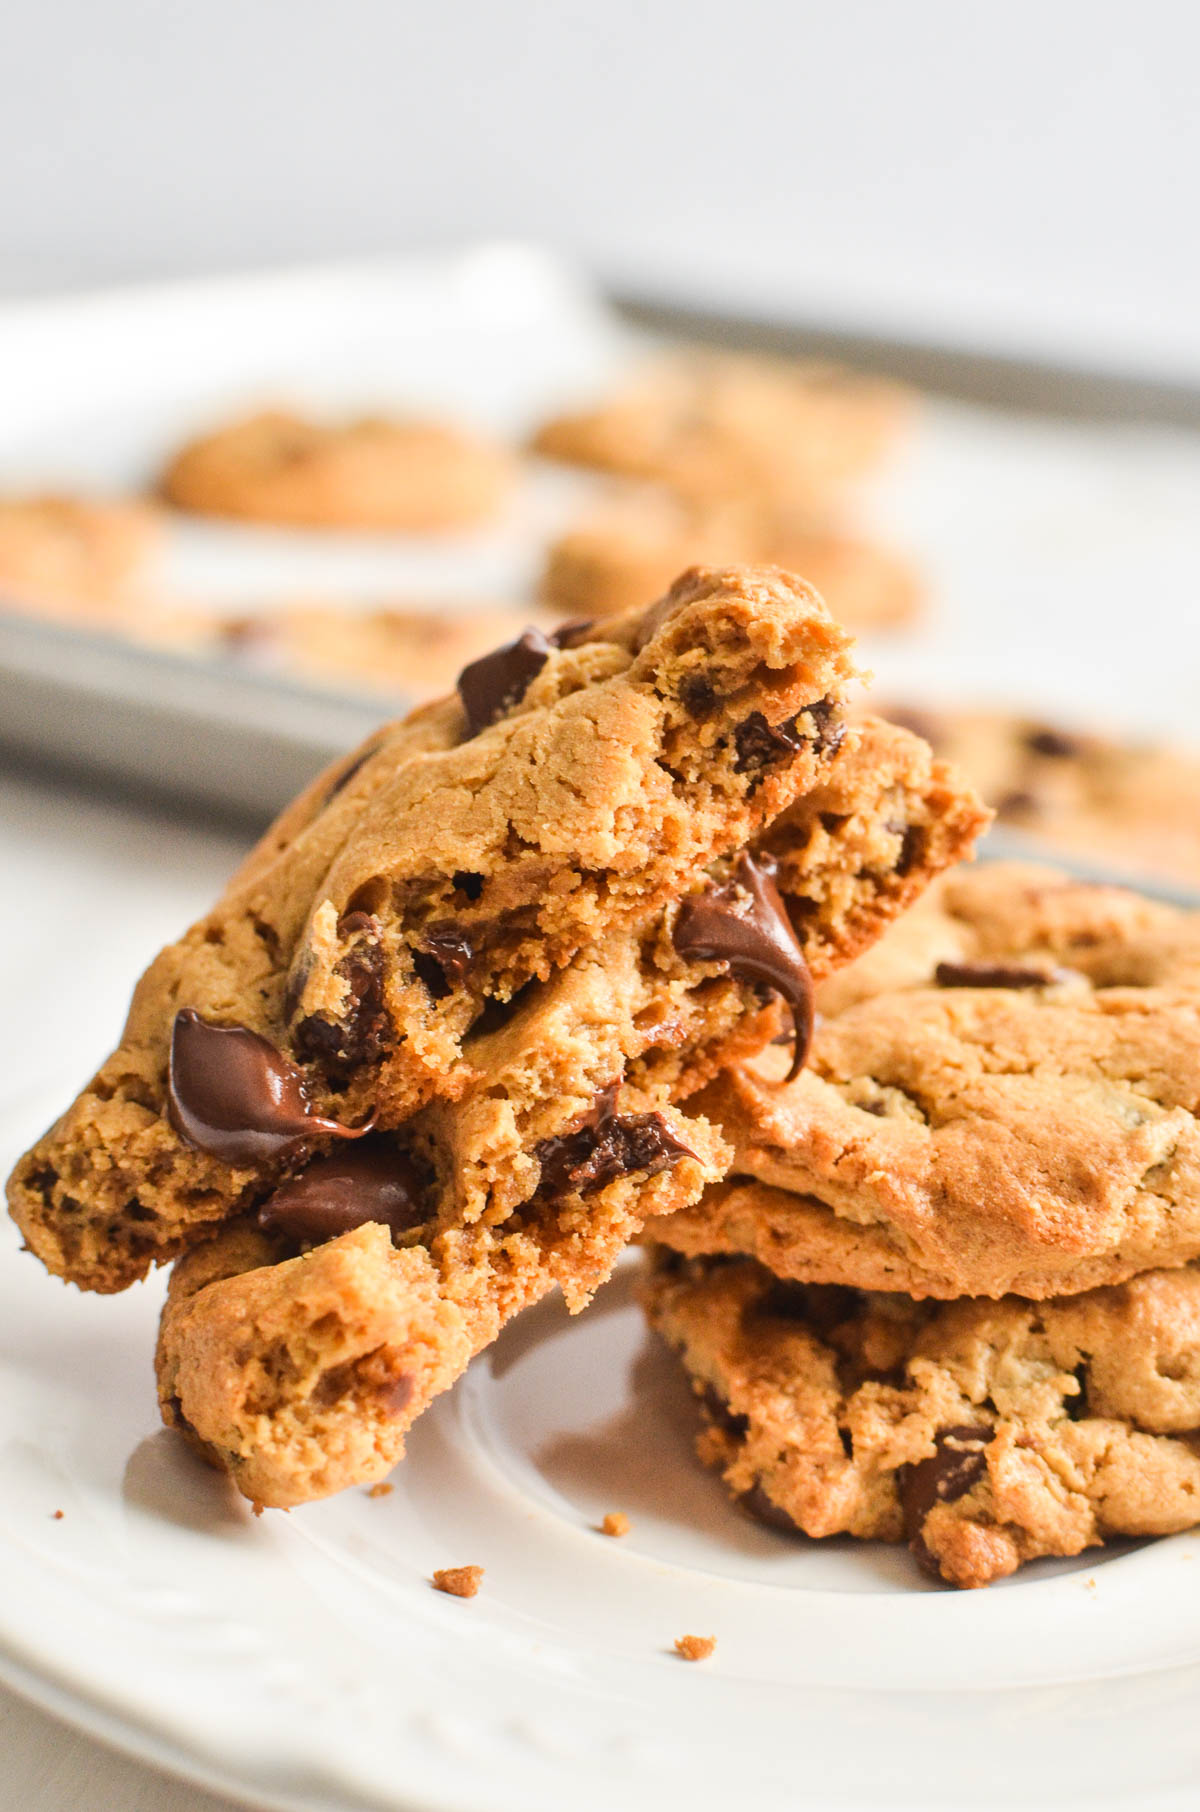 A flourless peanut butter chocolate chip cookie broken in half.